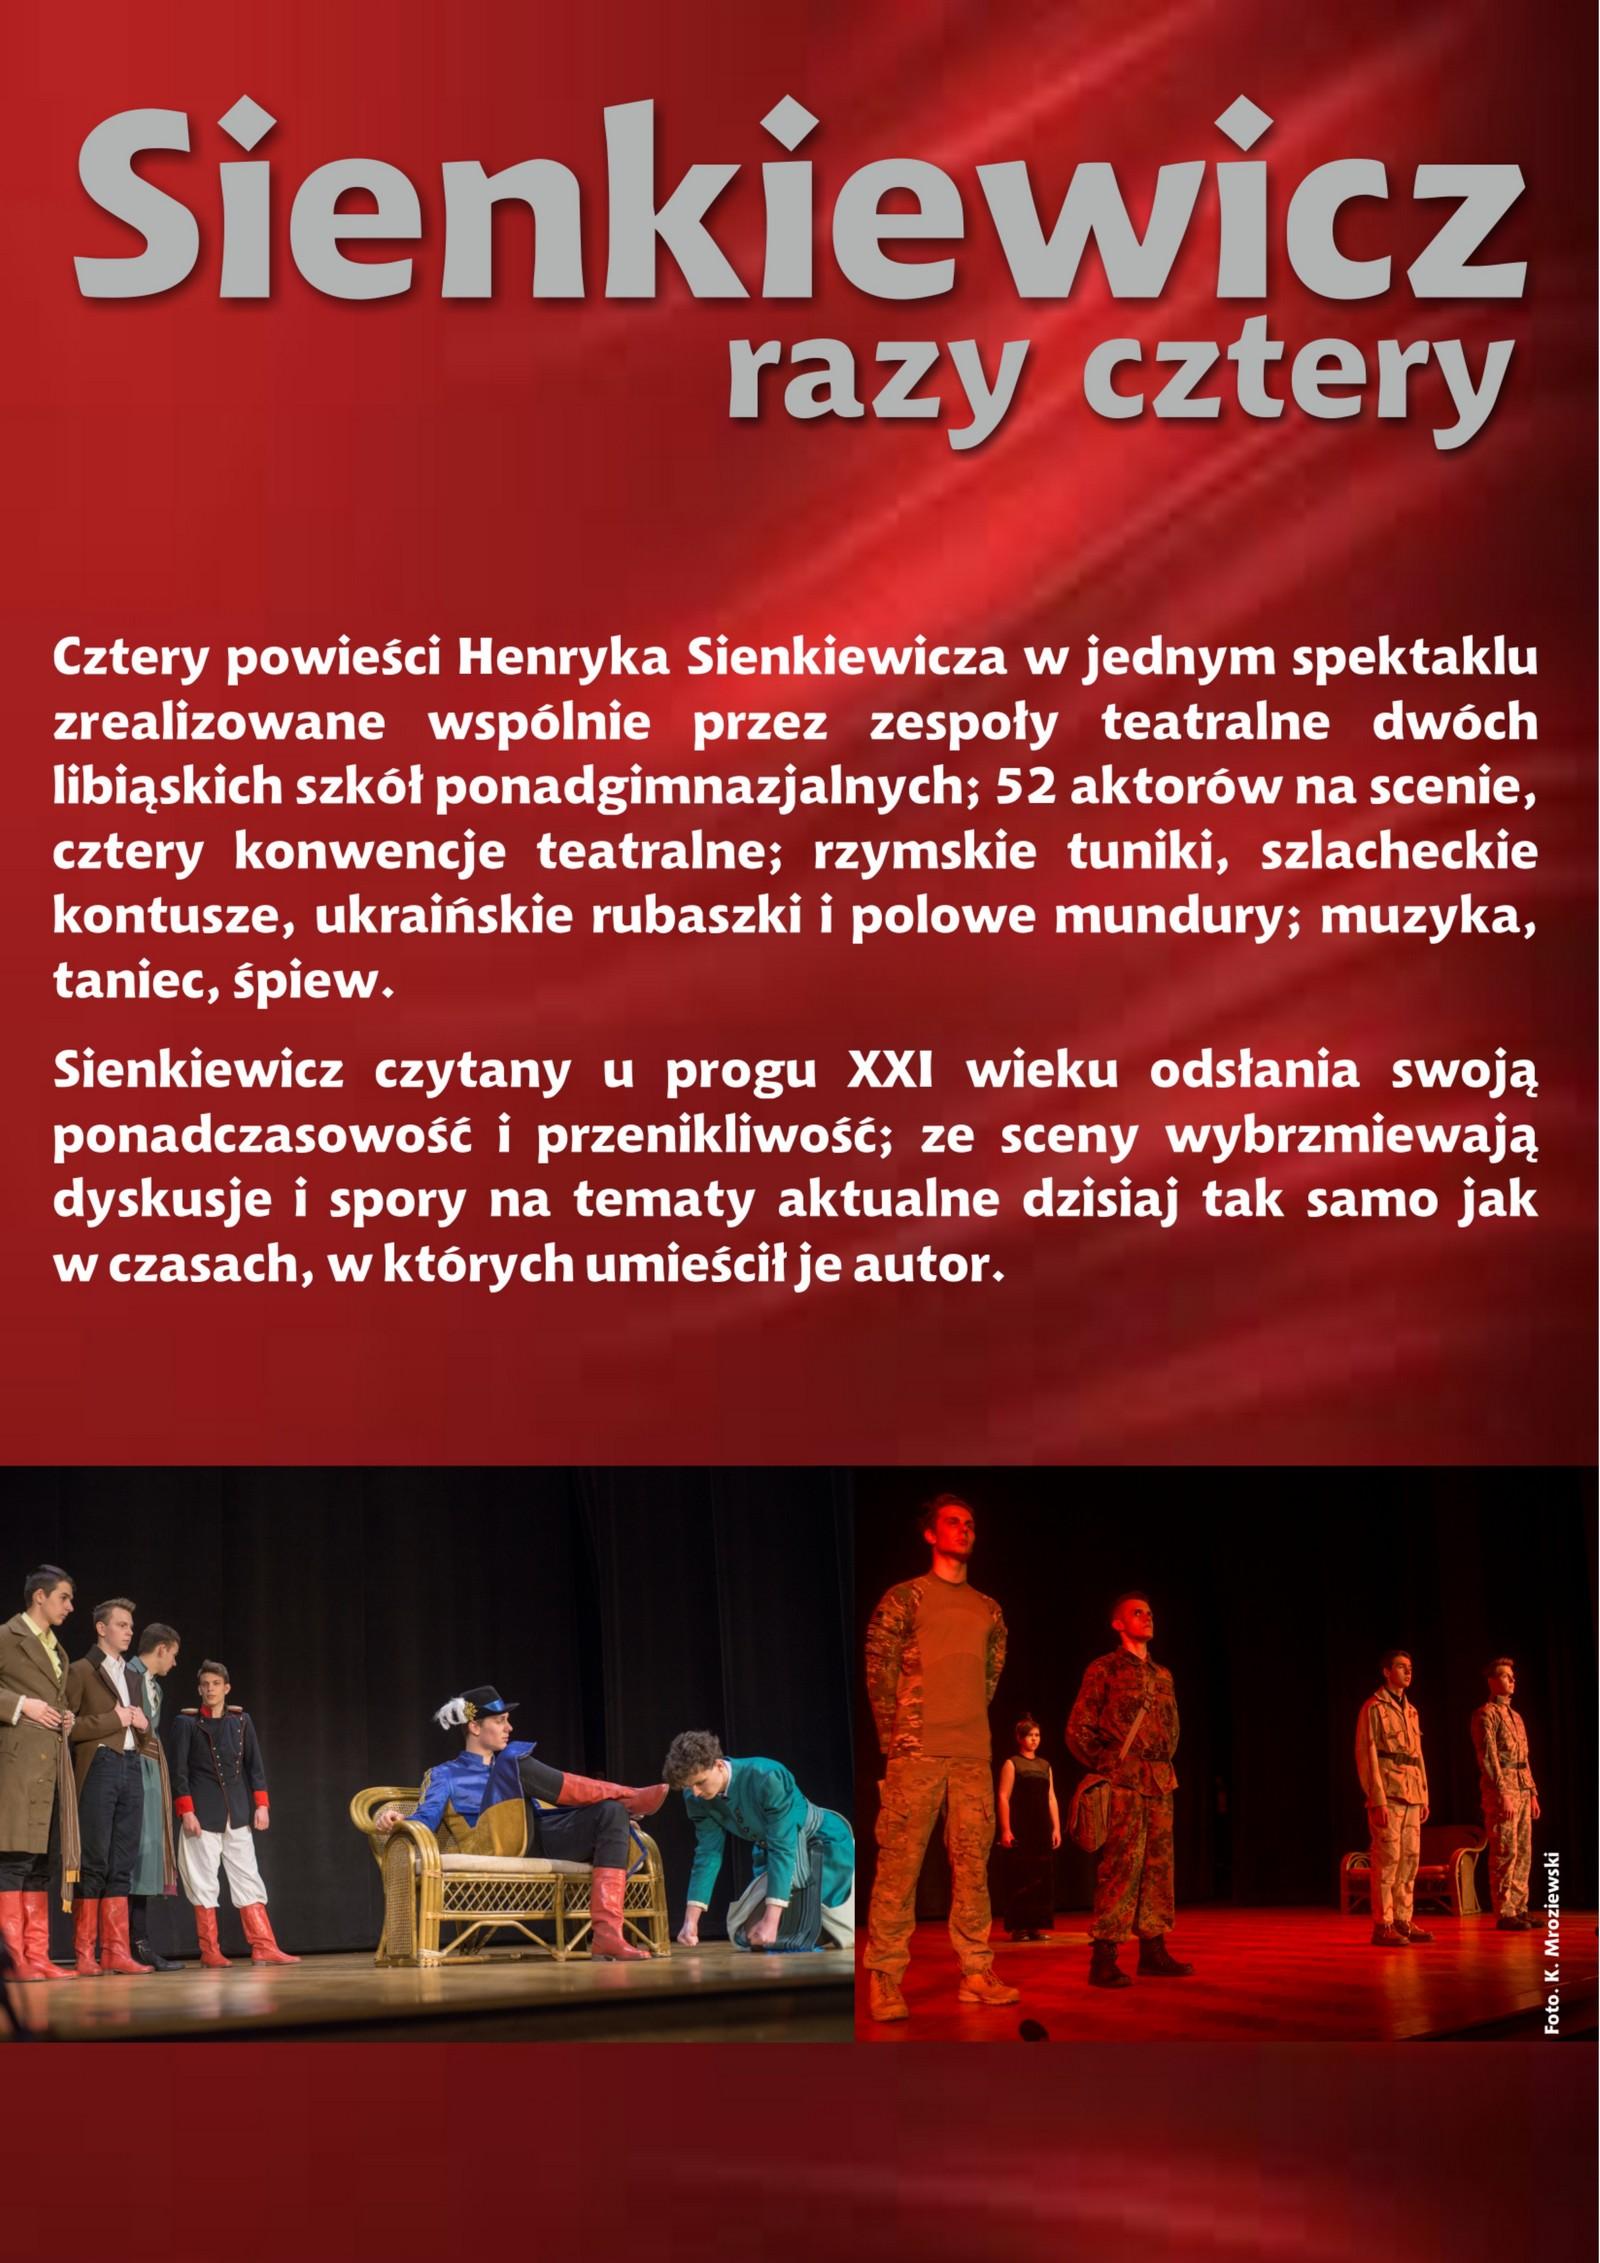 zap Sienk 2